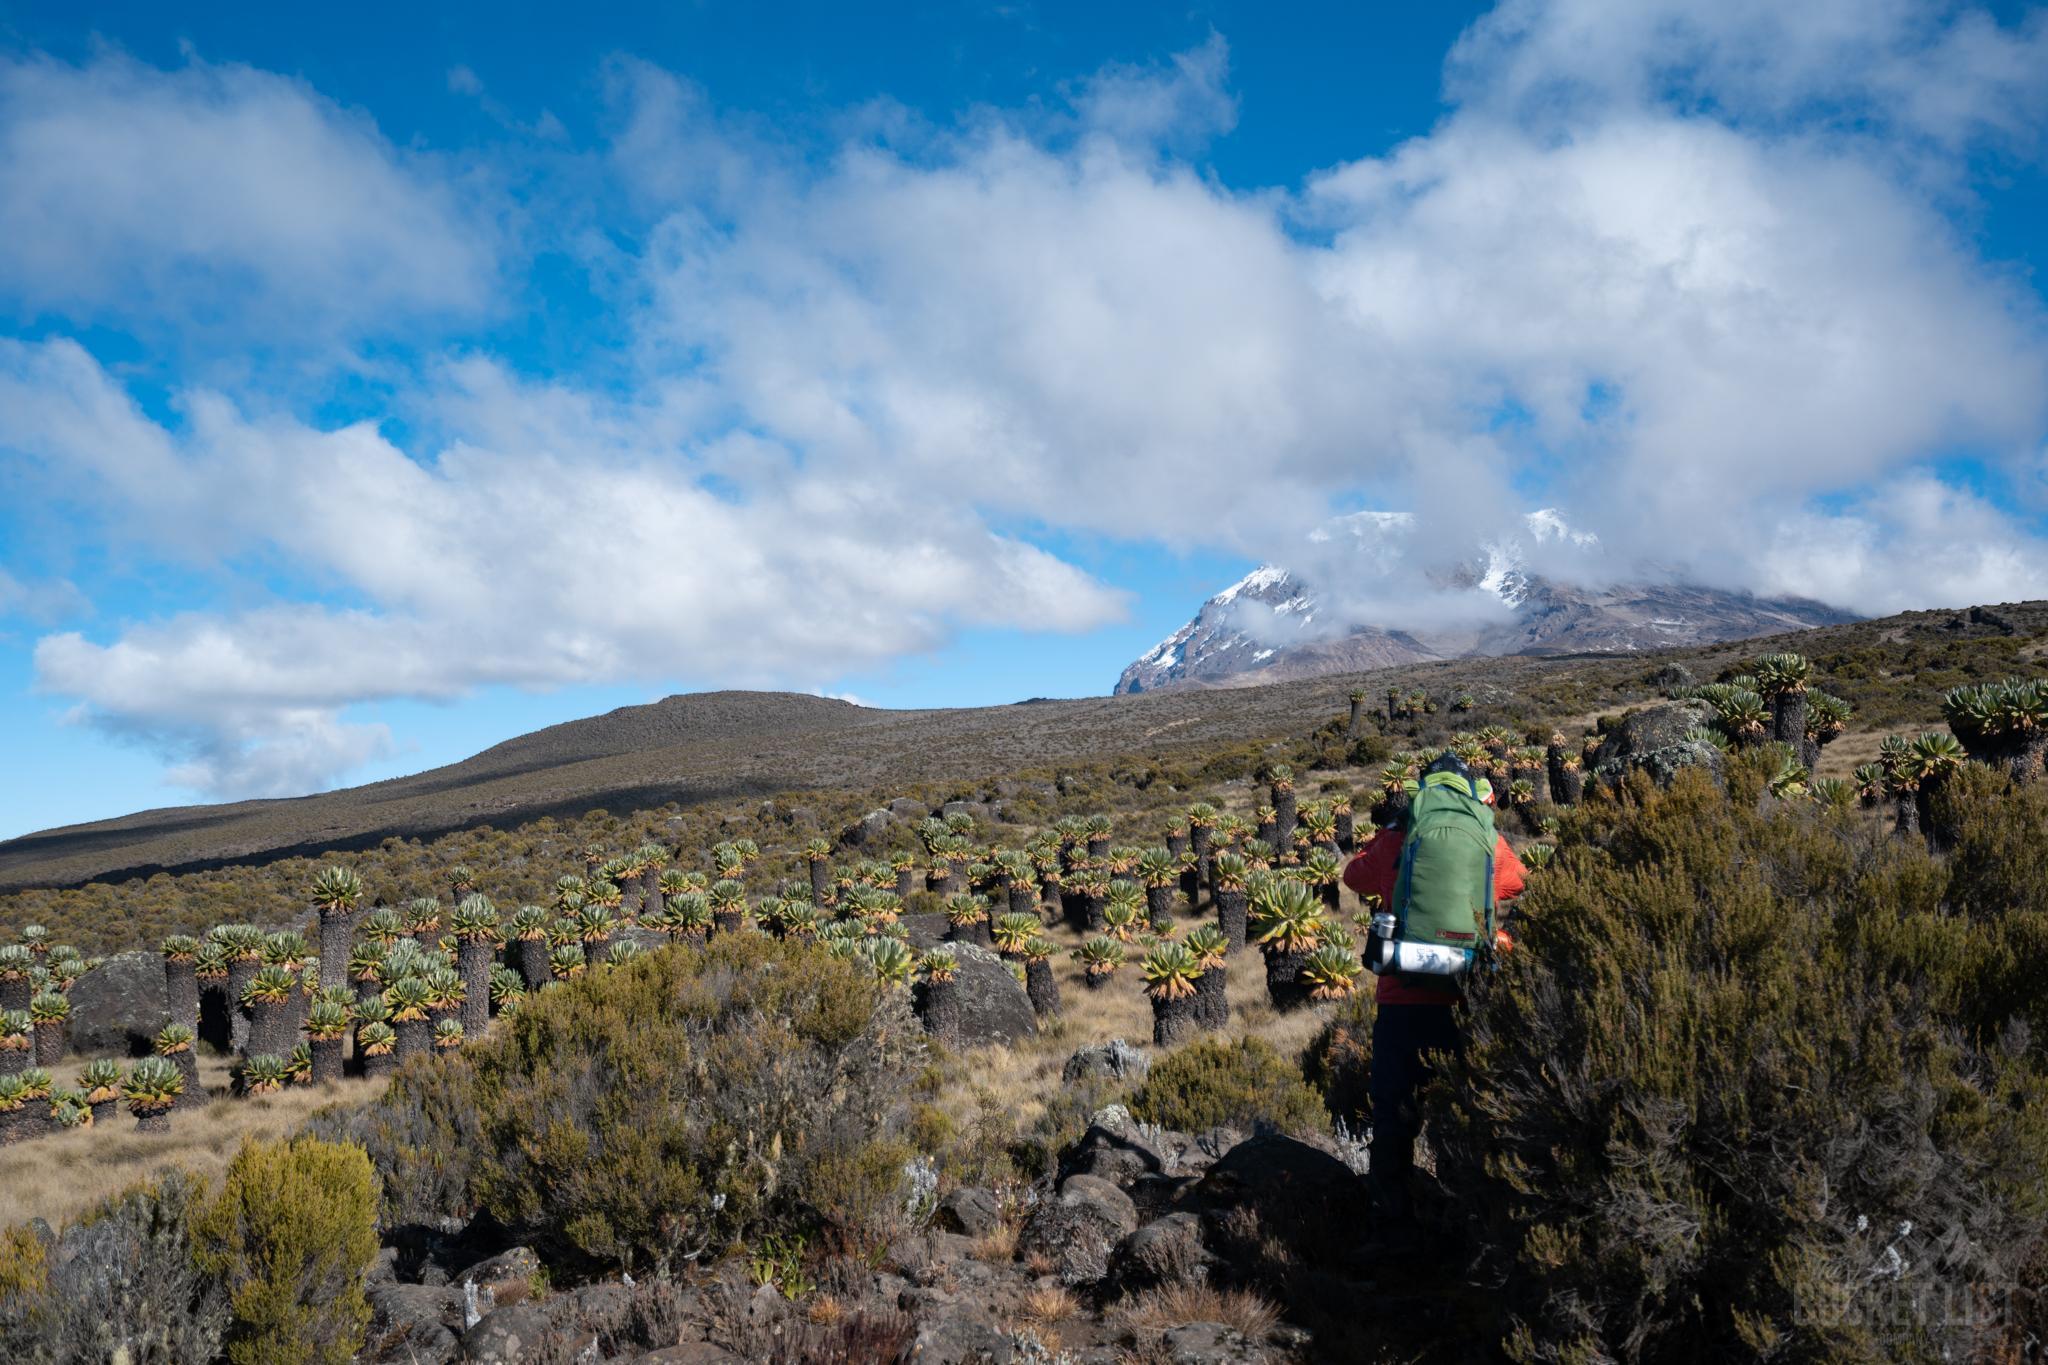 A trekker walking up a mountain